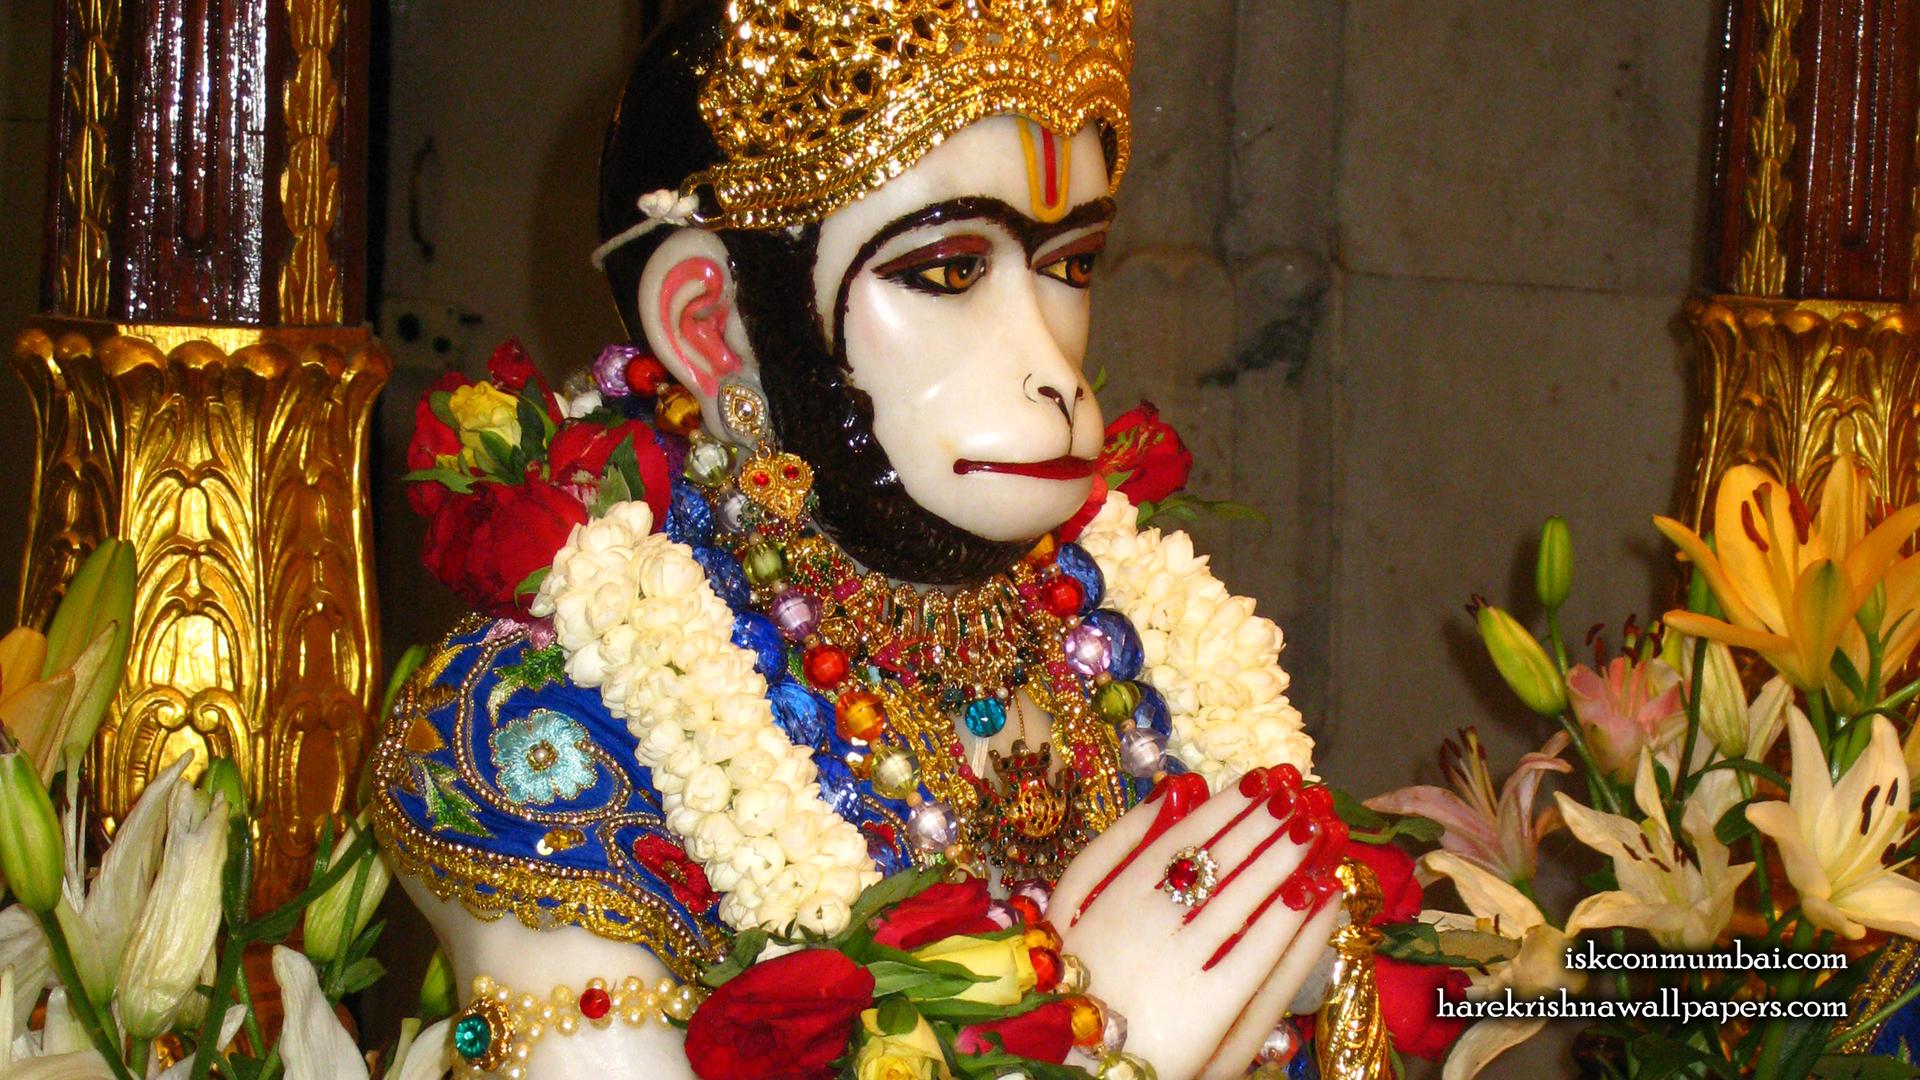 Sri Hanuman Face Wallpaper (009) Size 1920x1080 Download